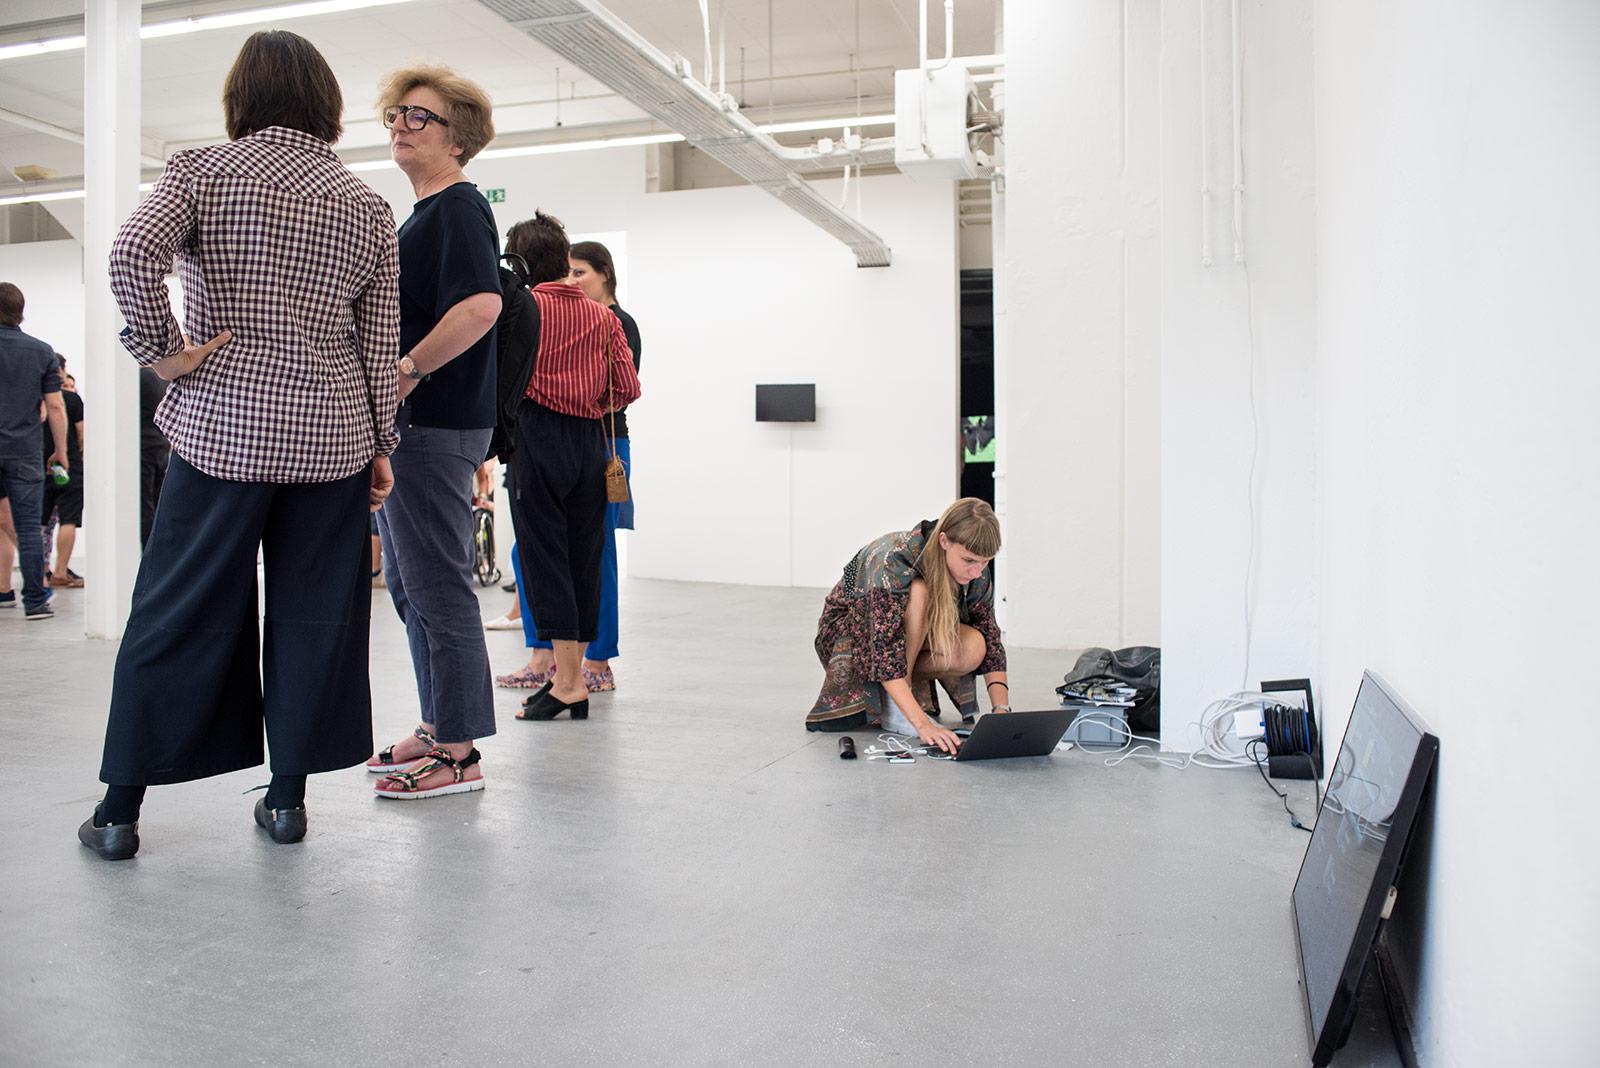 Jérome Leuba – Institut Kunst, Diplom 2017